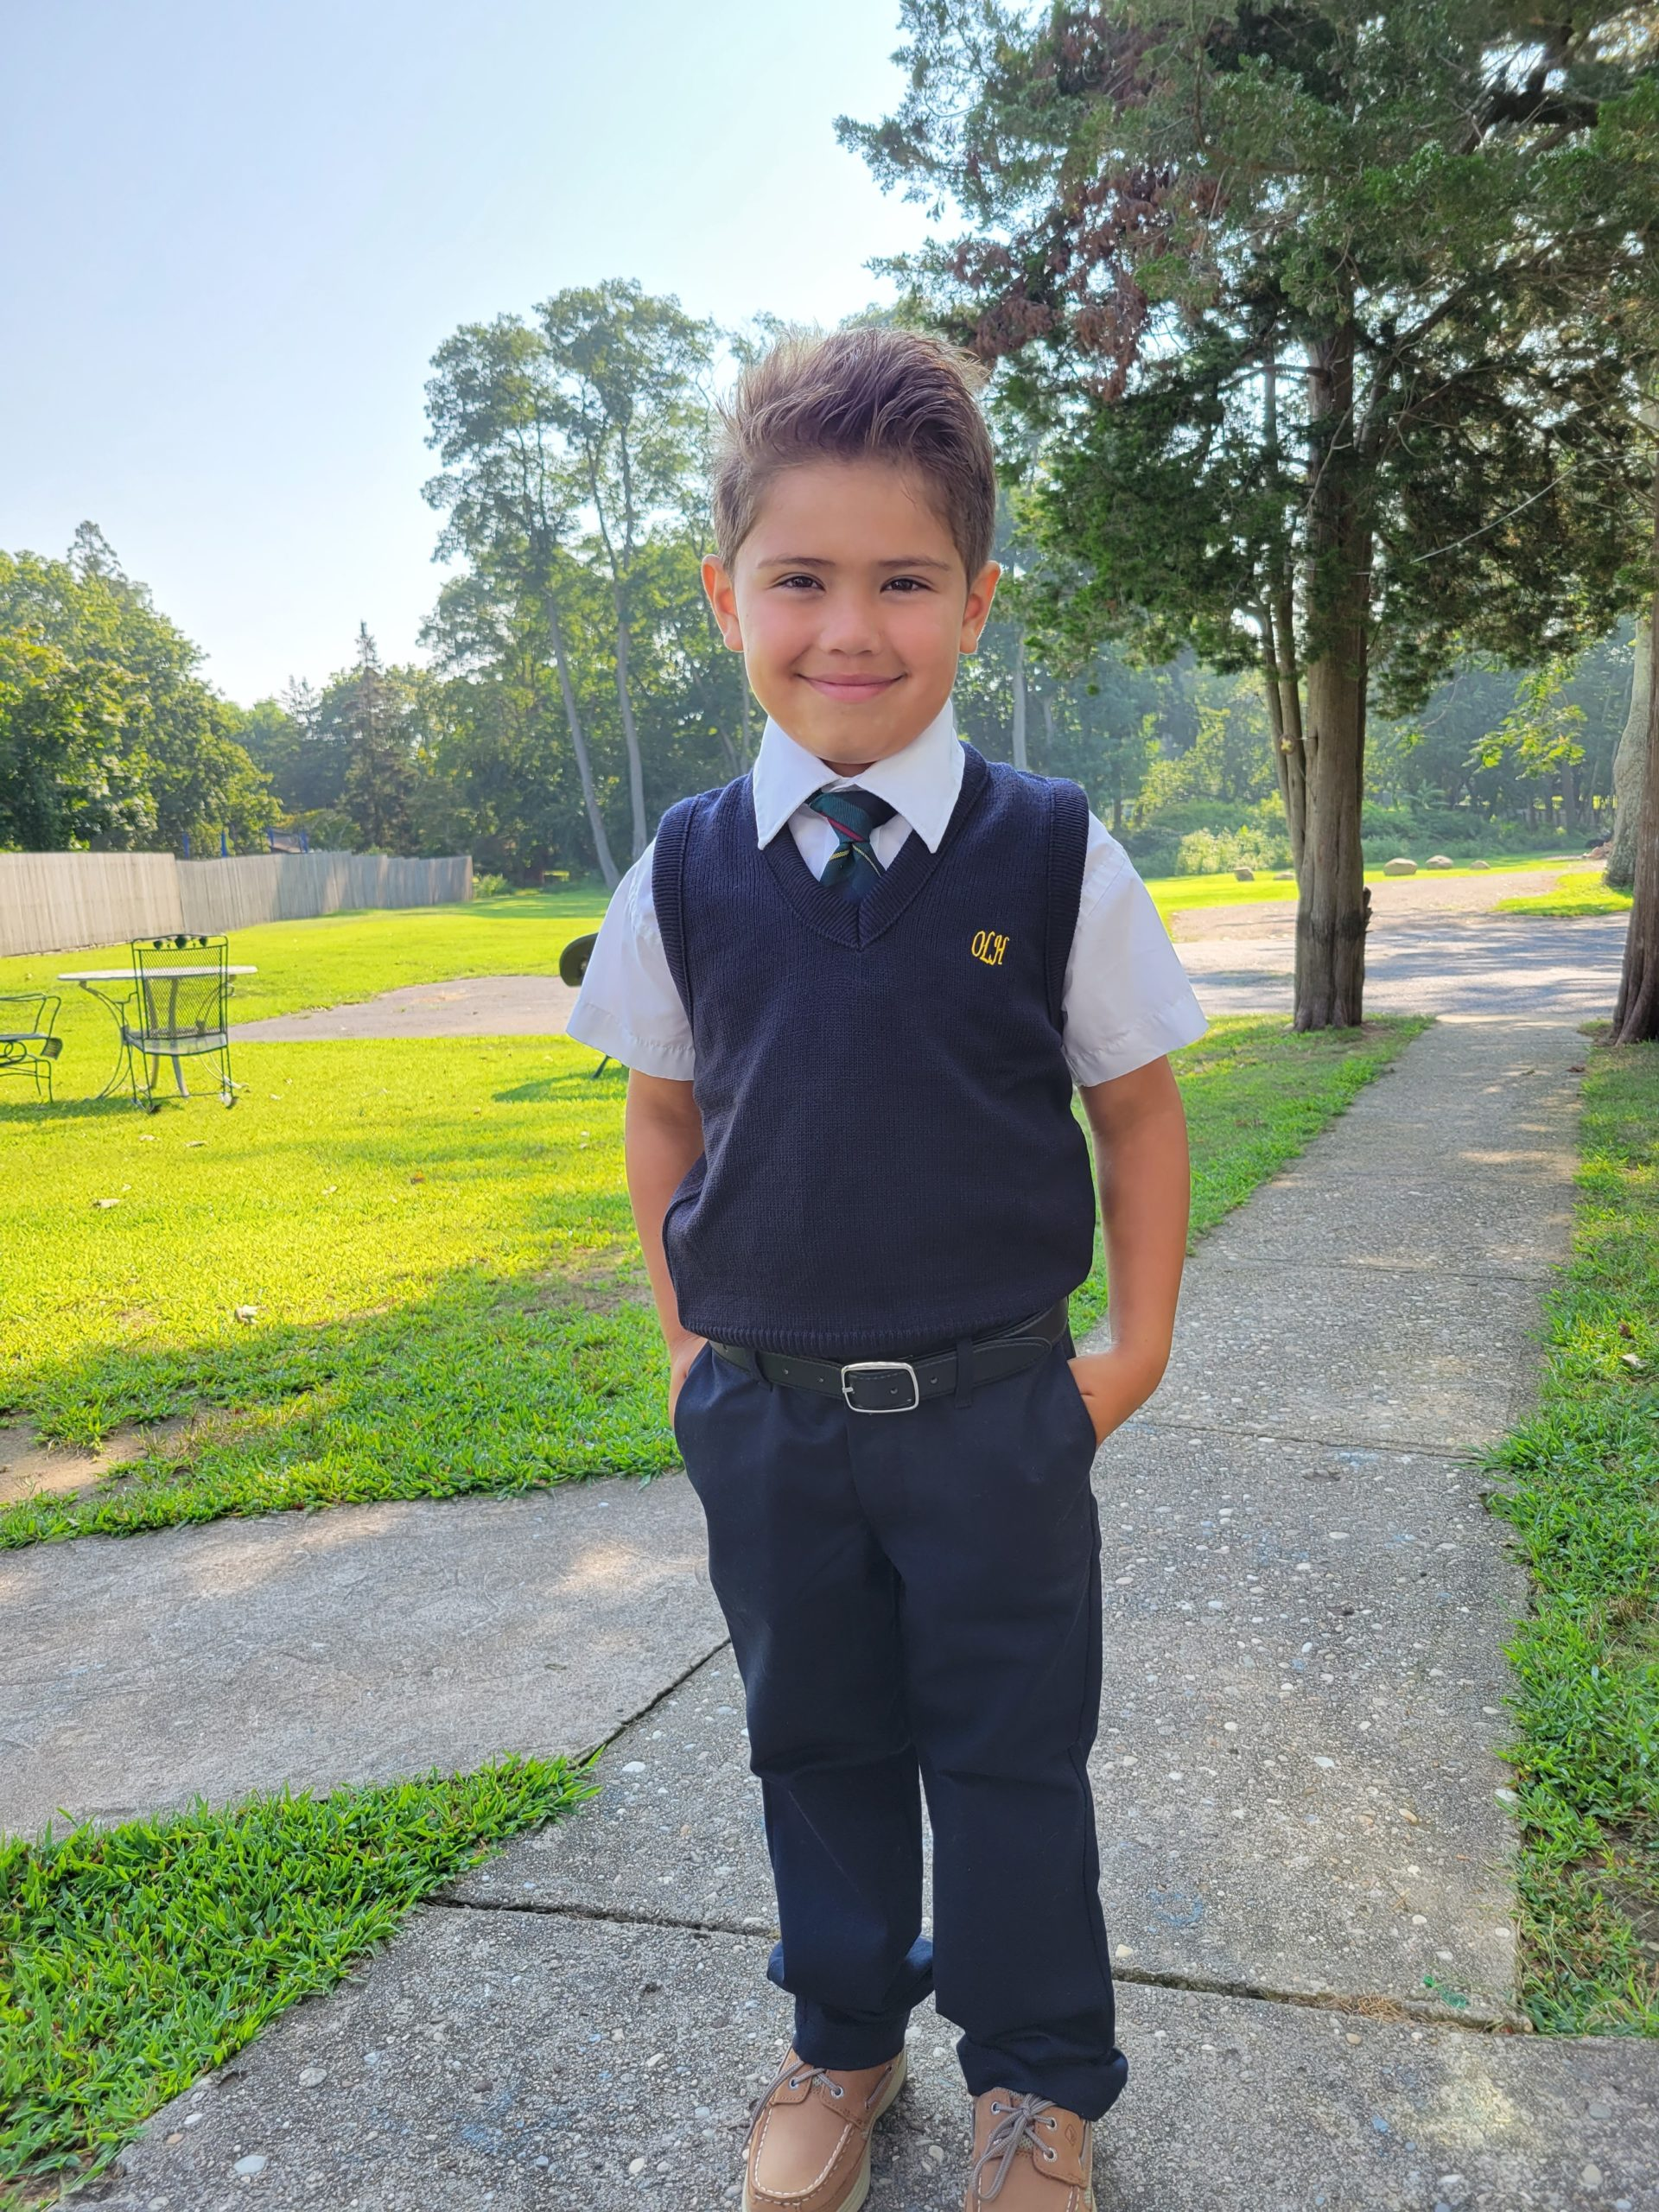 :  Incoming first grader Santiago Springer shows off his new uniform.